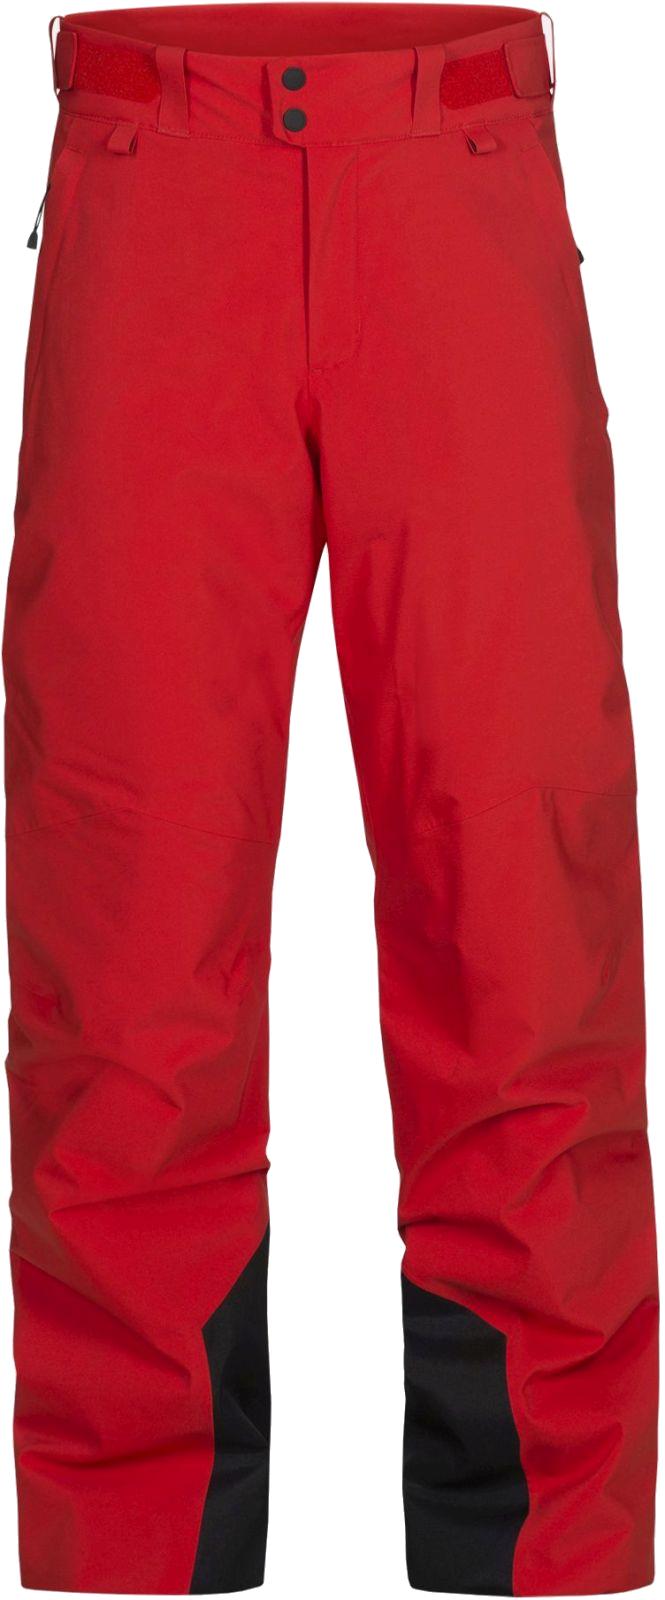 Peak Performance Maroon Pants - Dynared XL